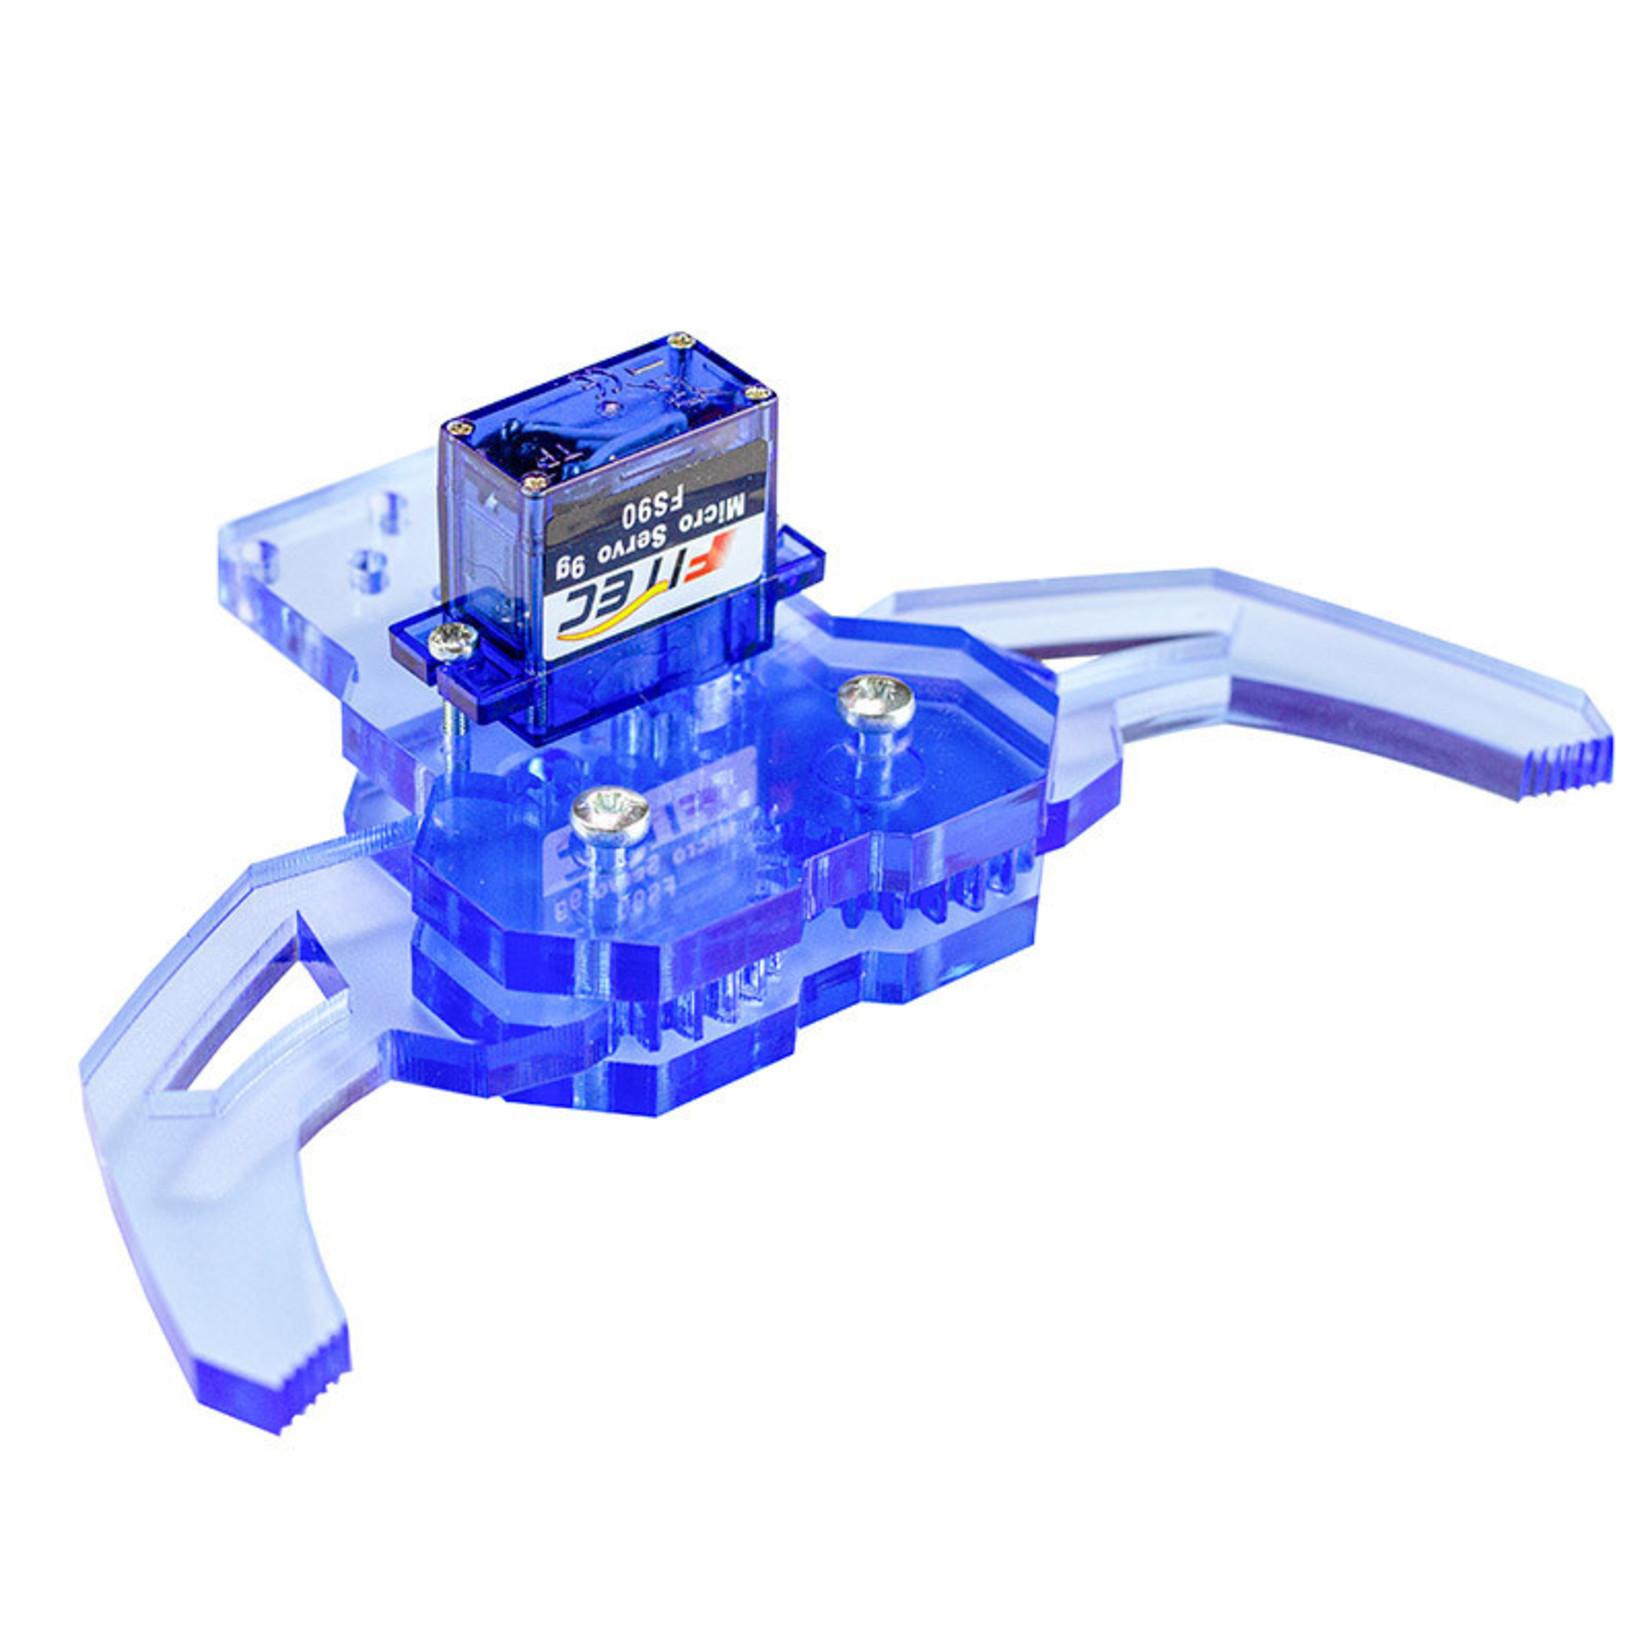 Kitronik Klaw MK2 Robotic Gripper Kit